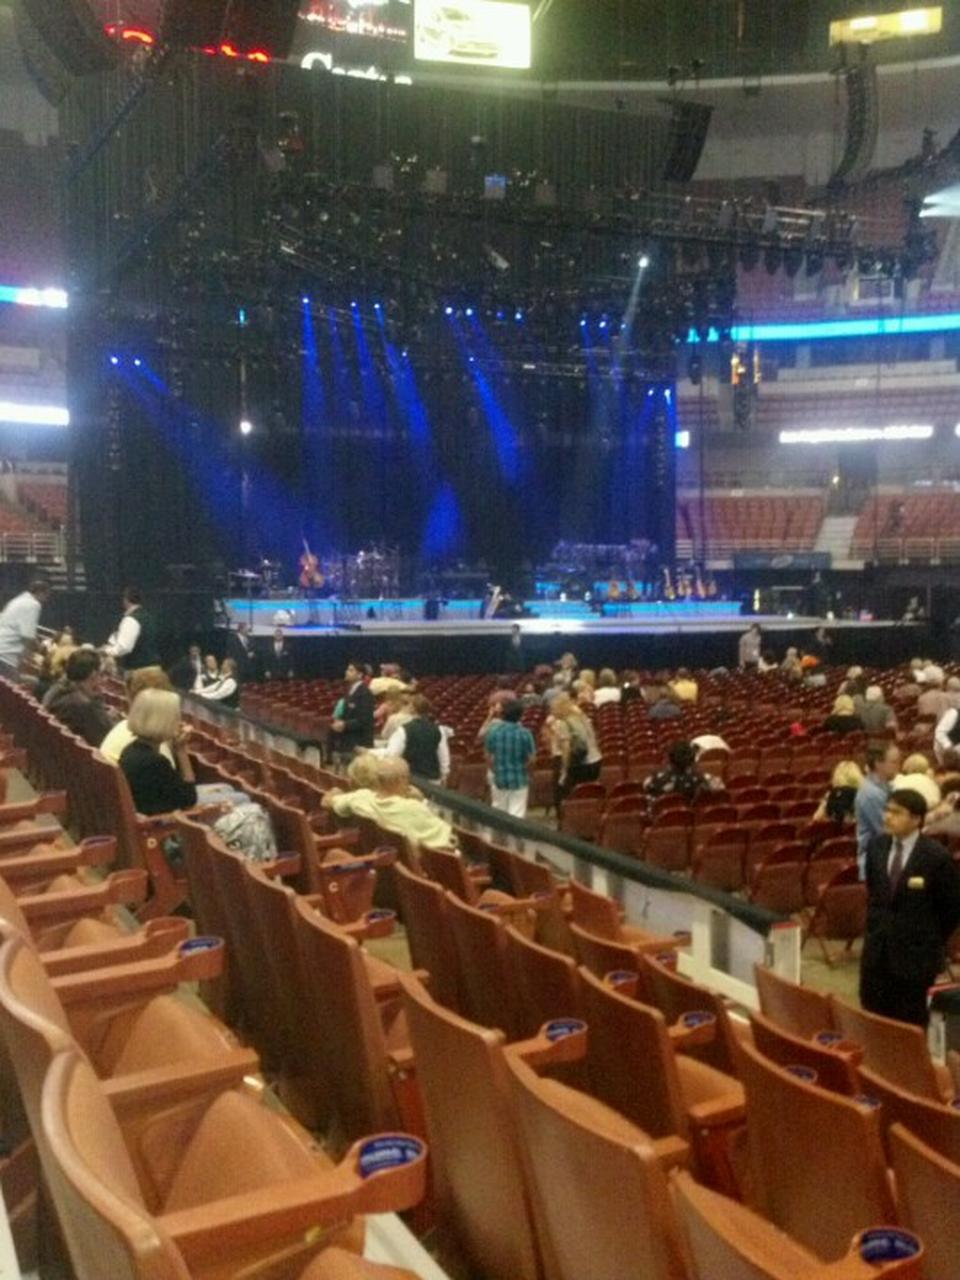 Elegant Concert Seat View For Honda Center Section 207, ...